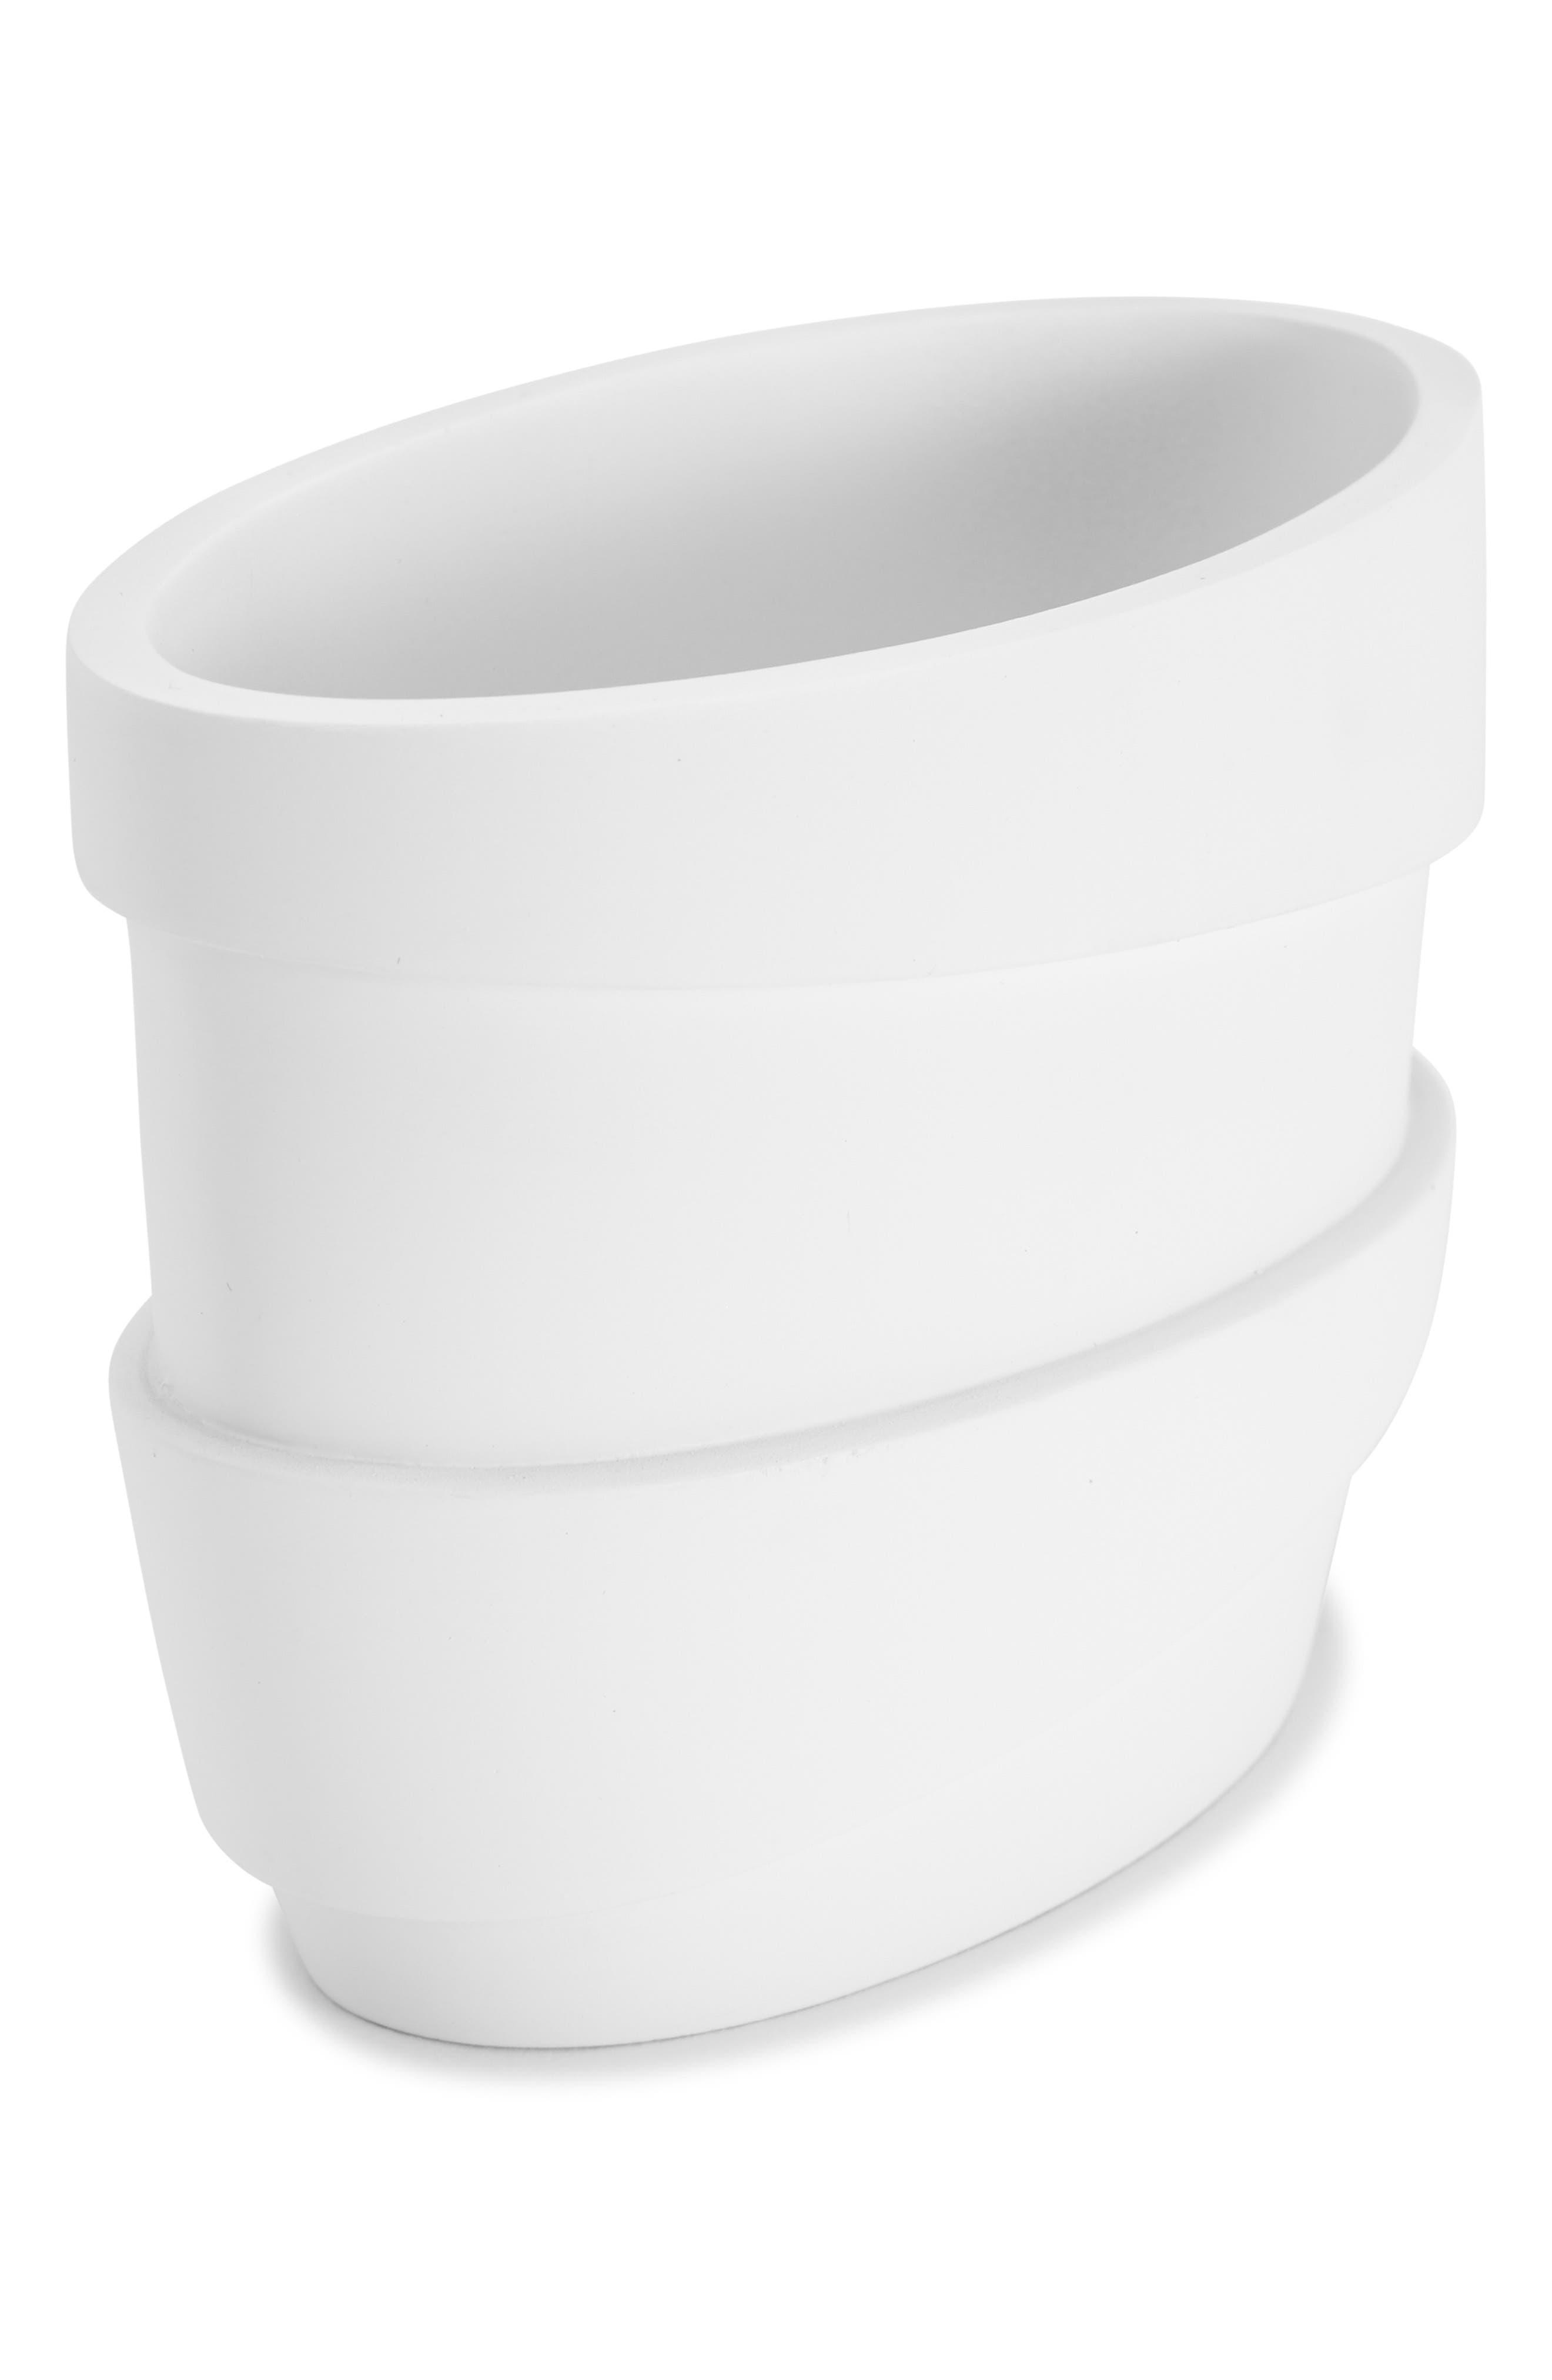 KASSATEX Alpine Toothbrush Holder, Main, color, WHITE